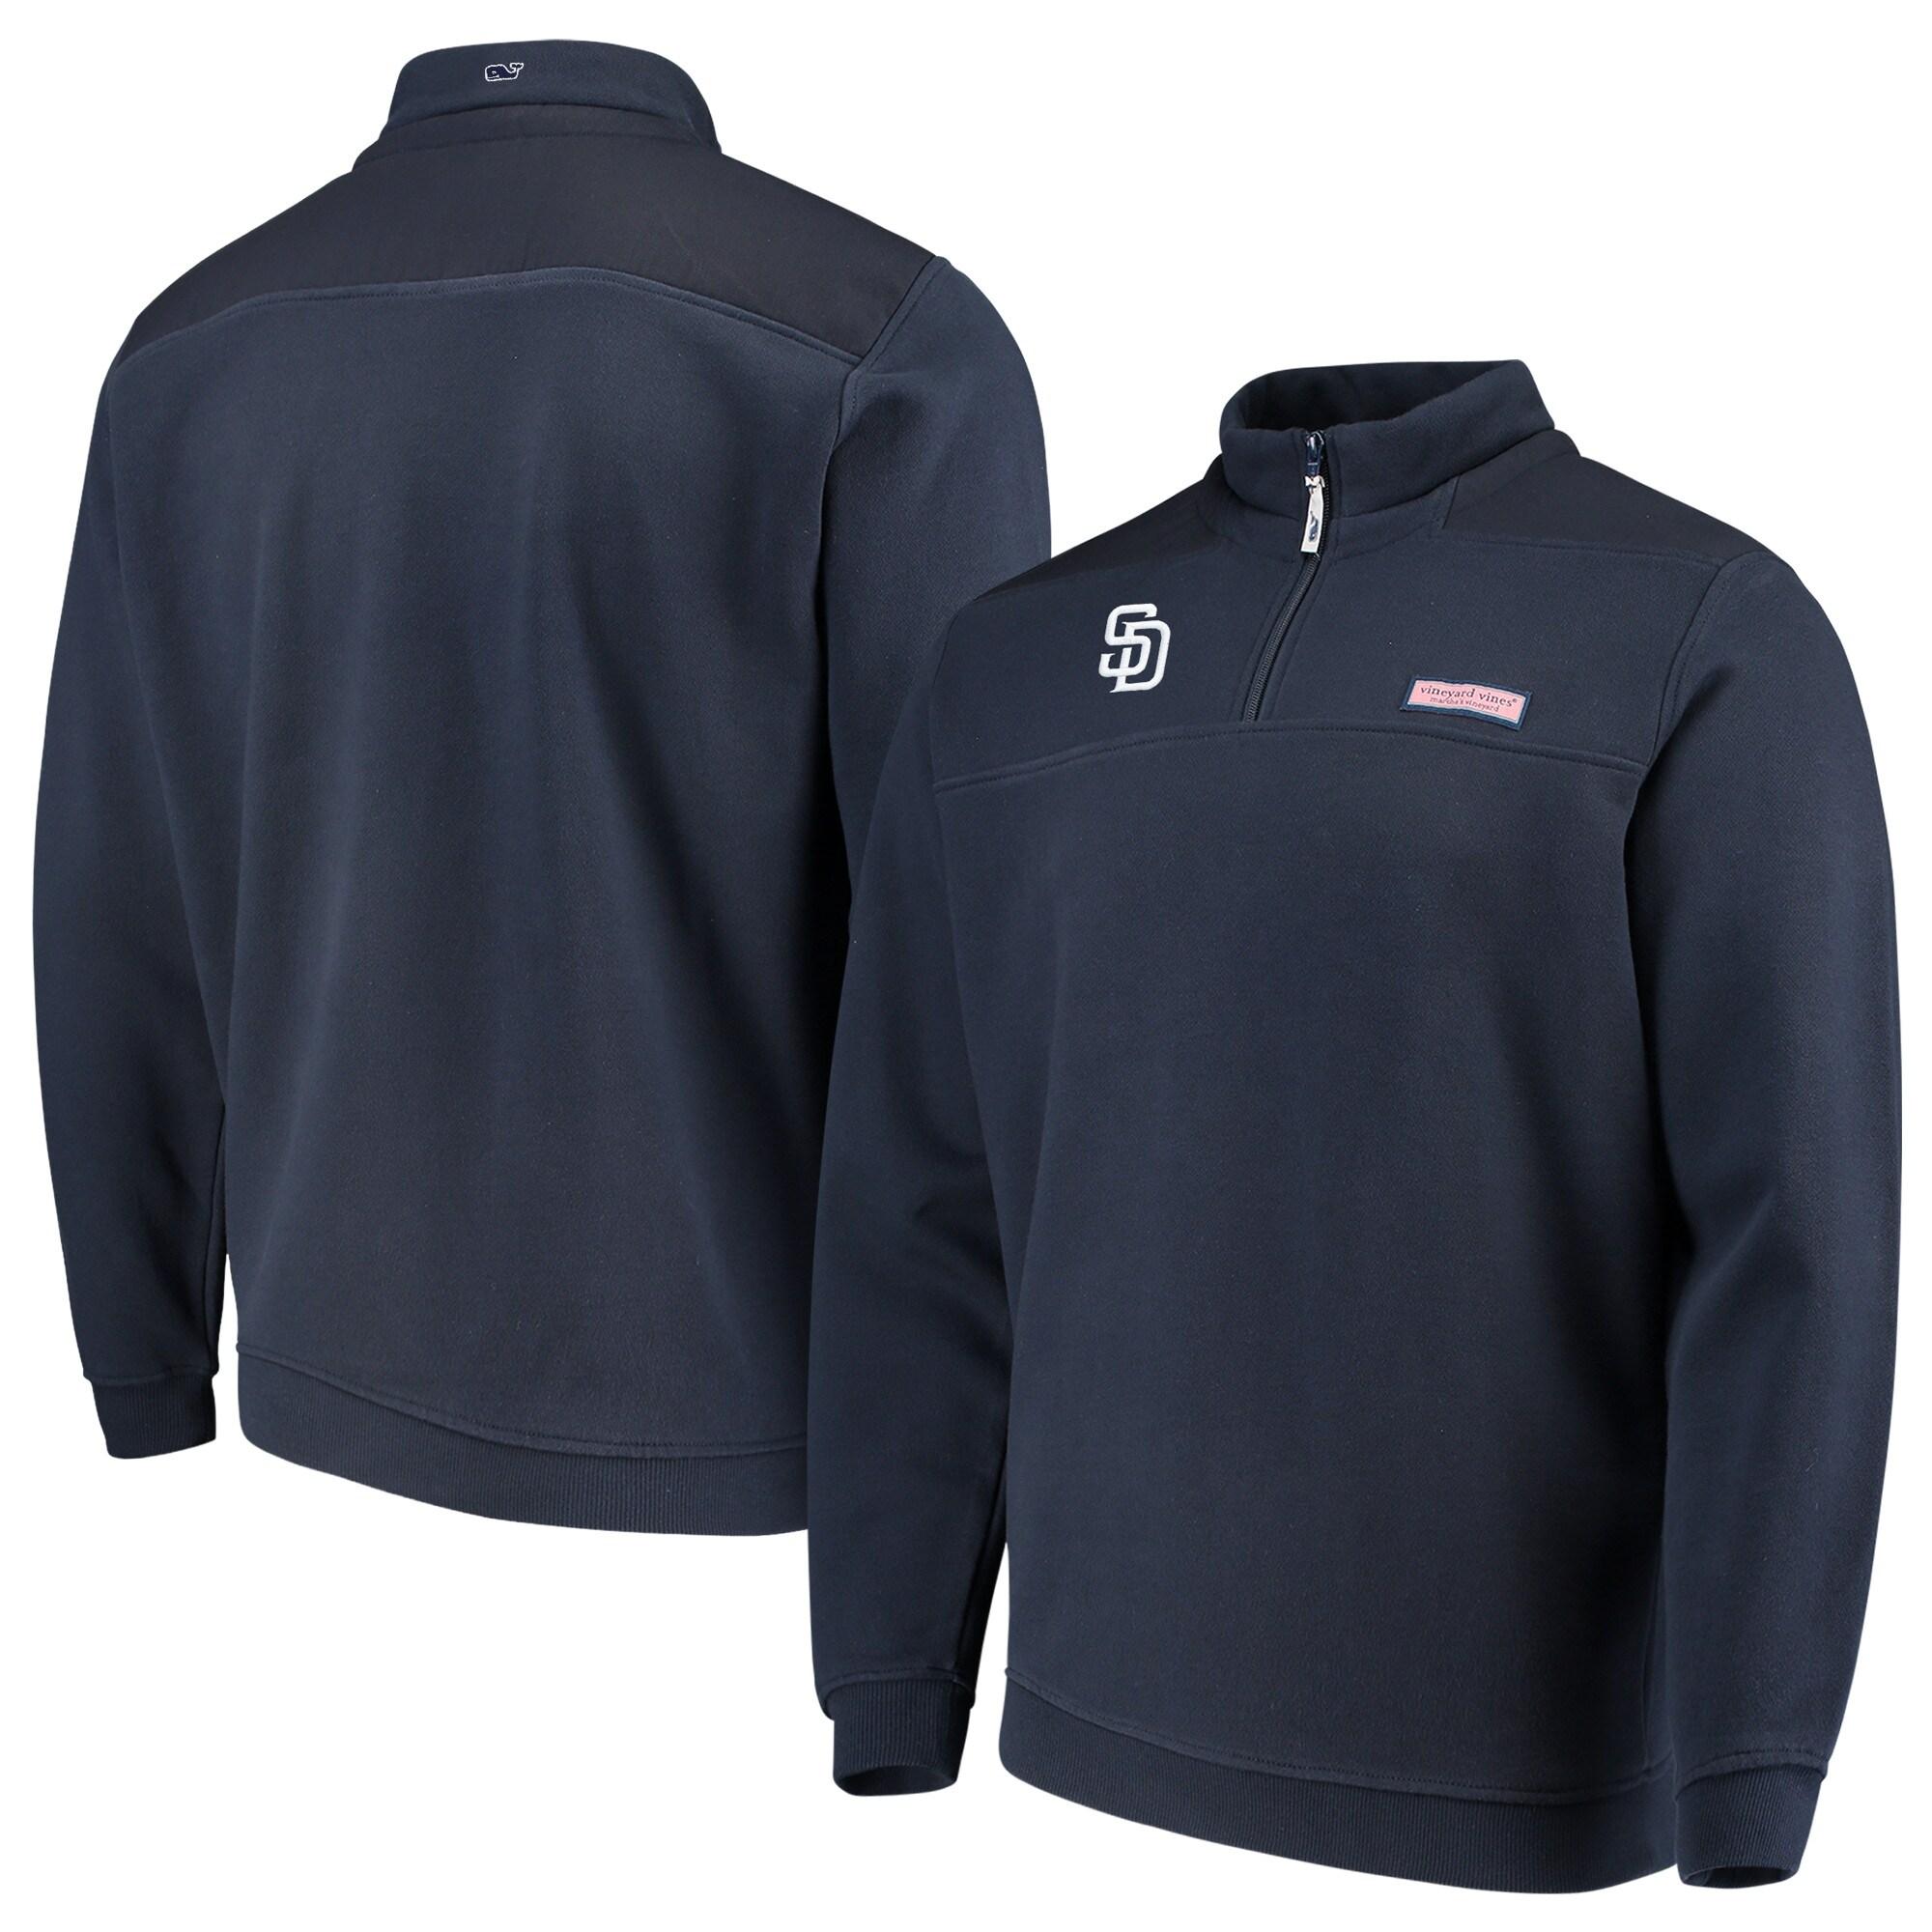 San Diego Padres Vineyard Vines Shep Shirt Quarter-Zip Pullover Jacket - Navy